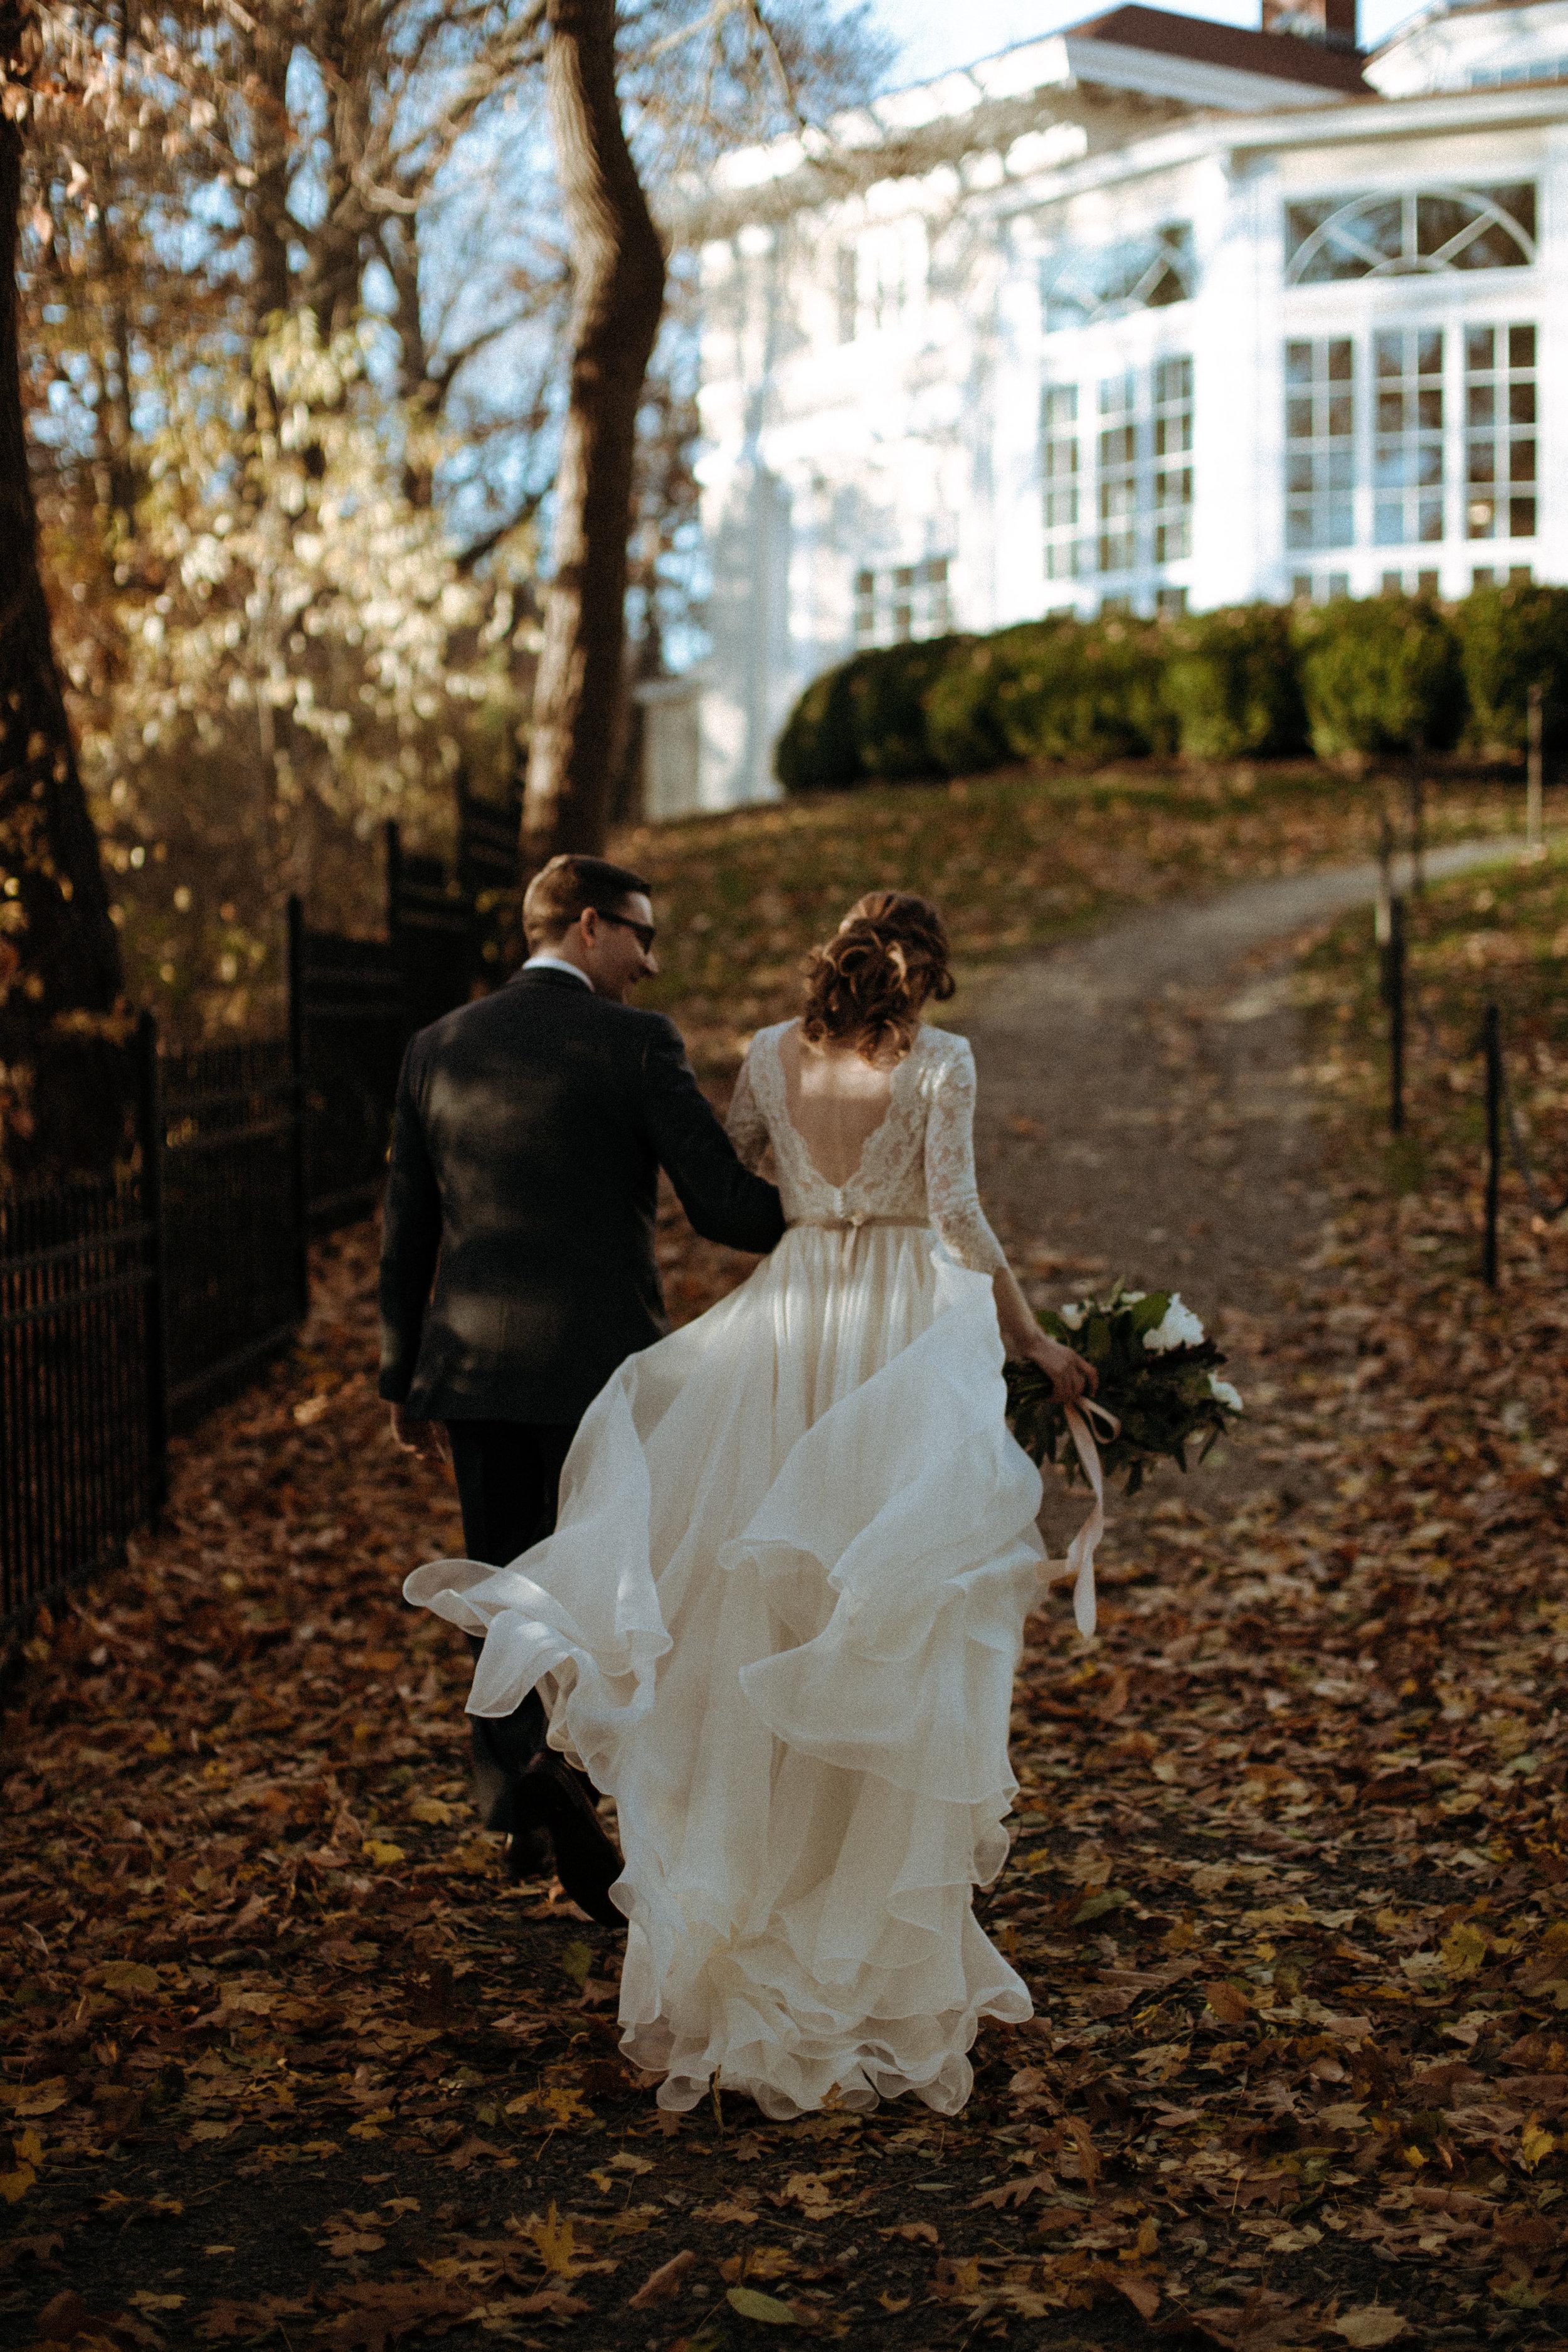 beverly_ma_wedding-14.jpg